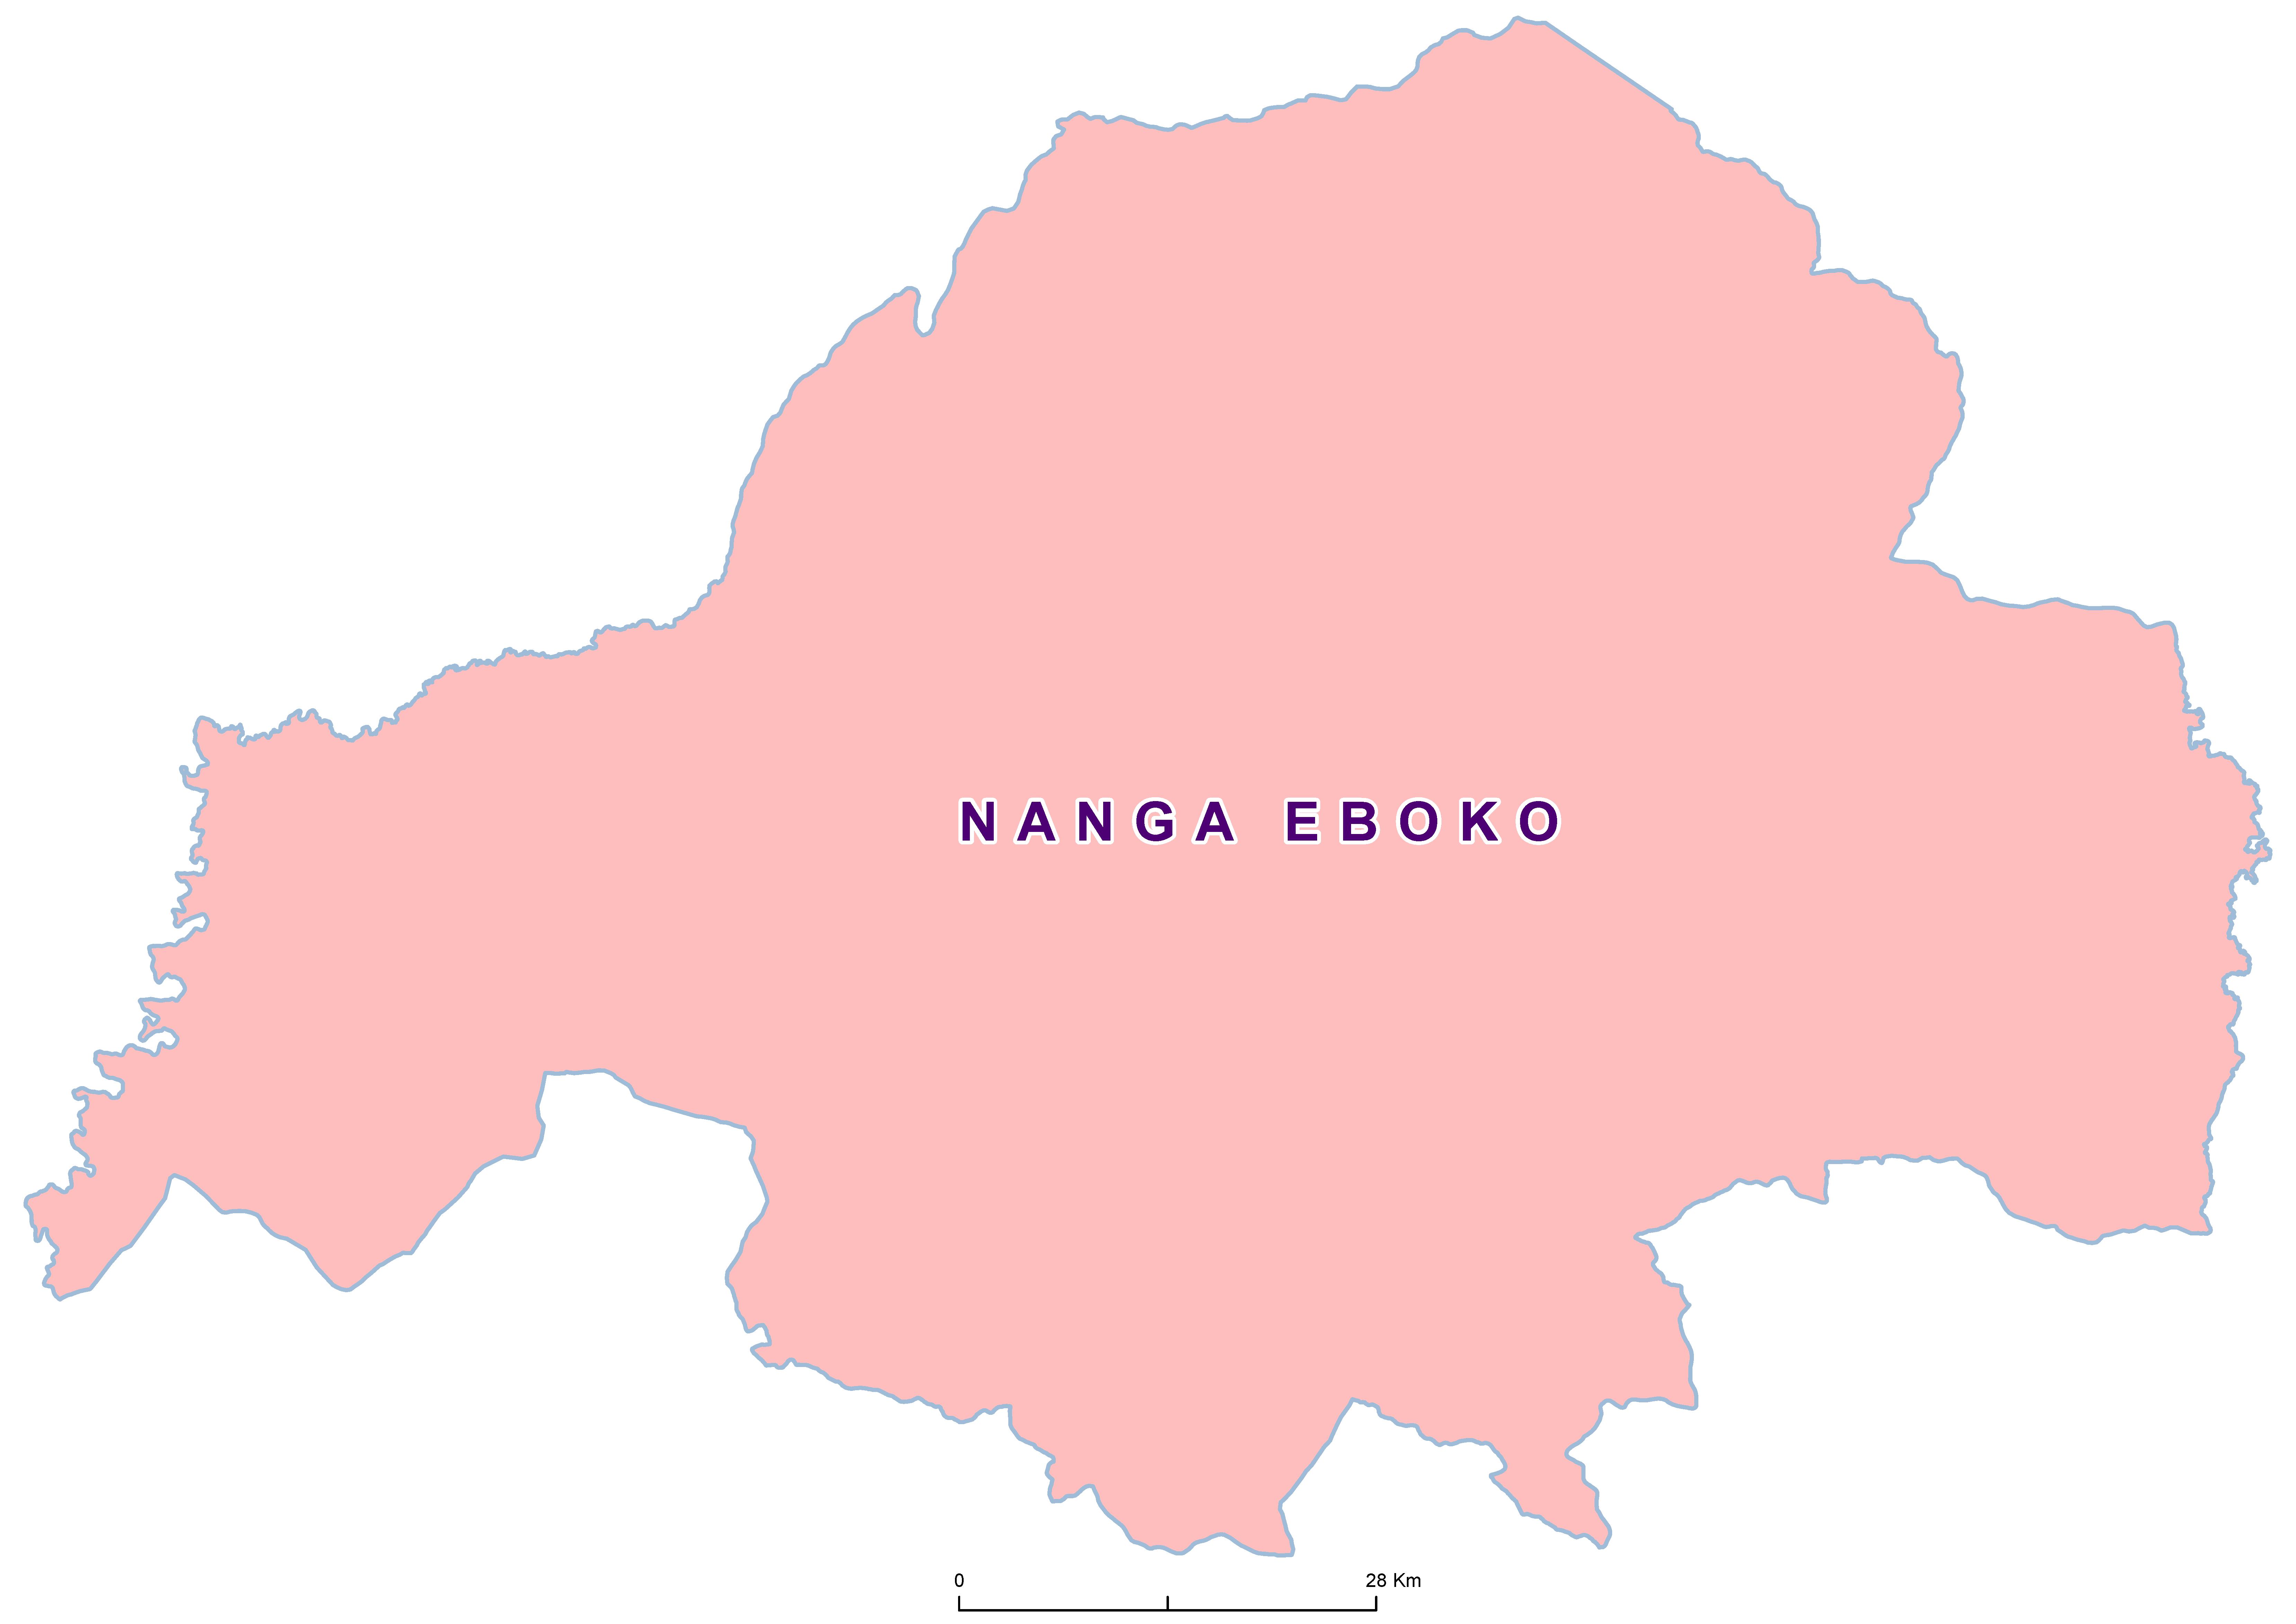 Nanga eboko Mean SCH 19850001